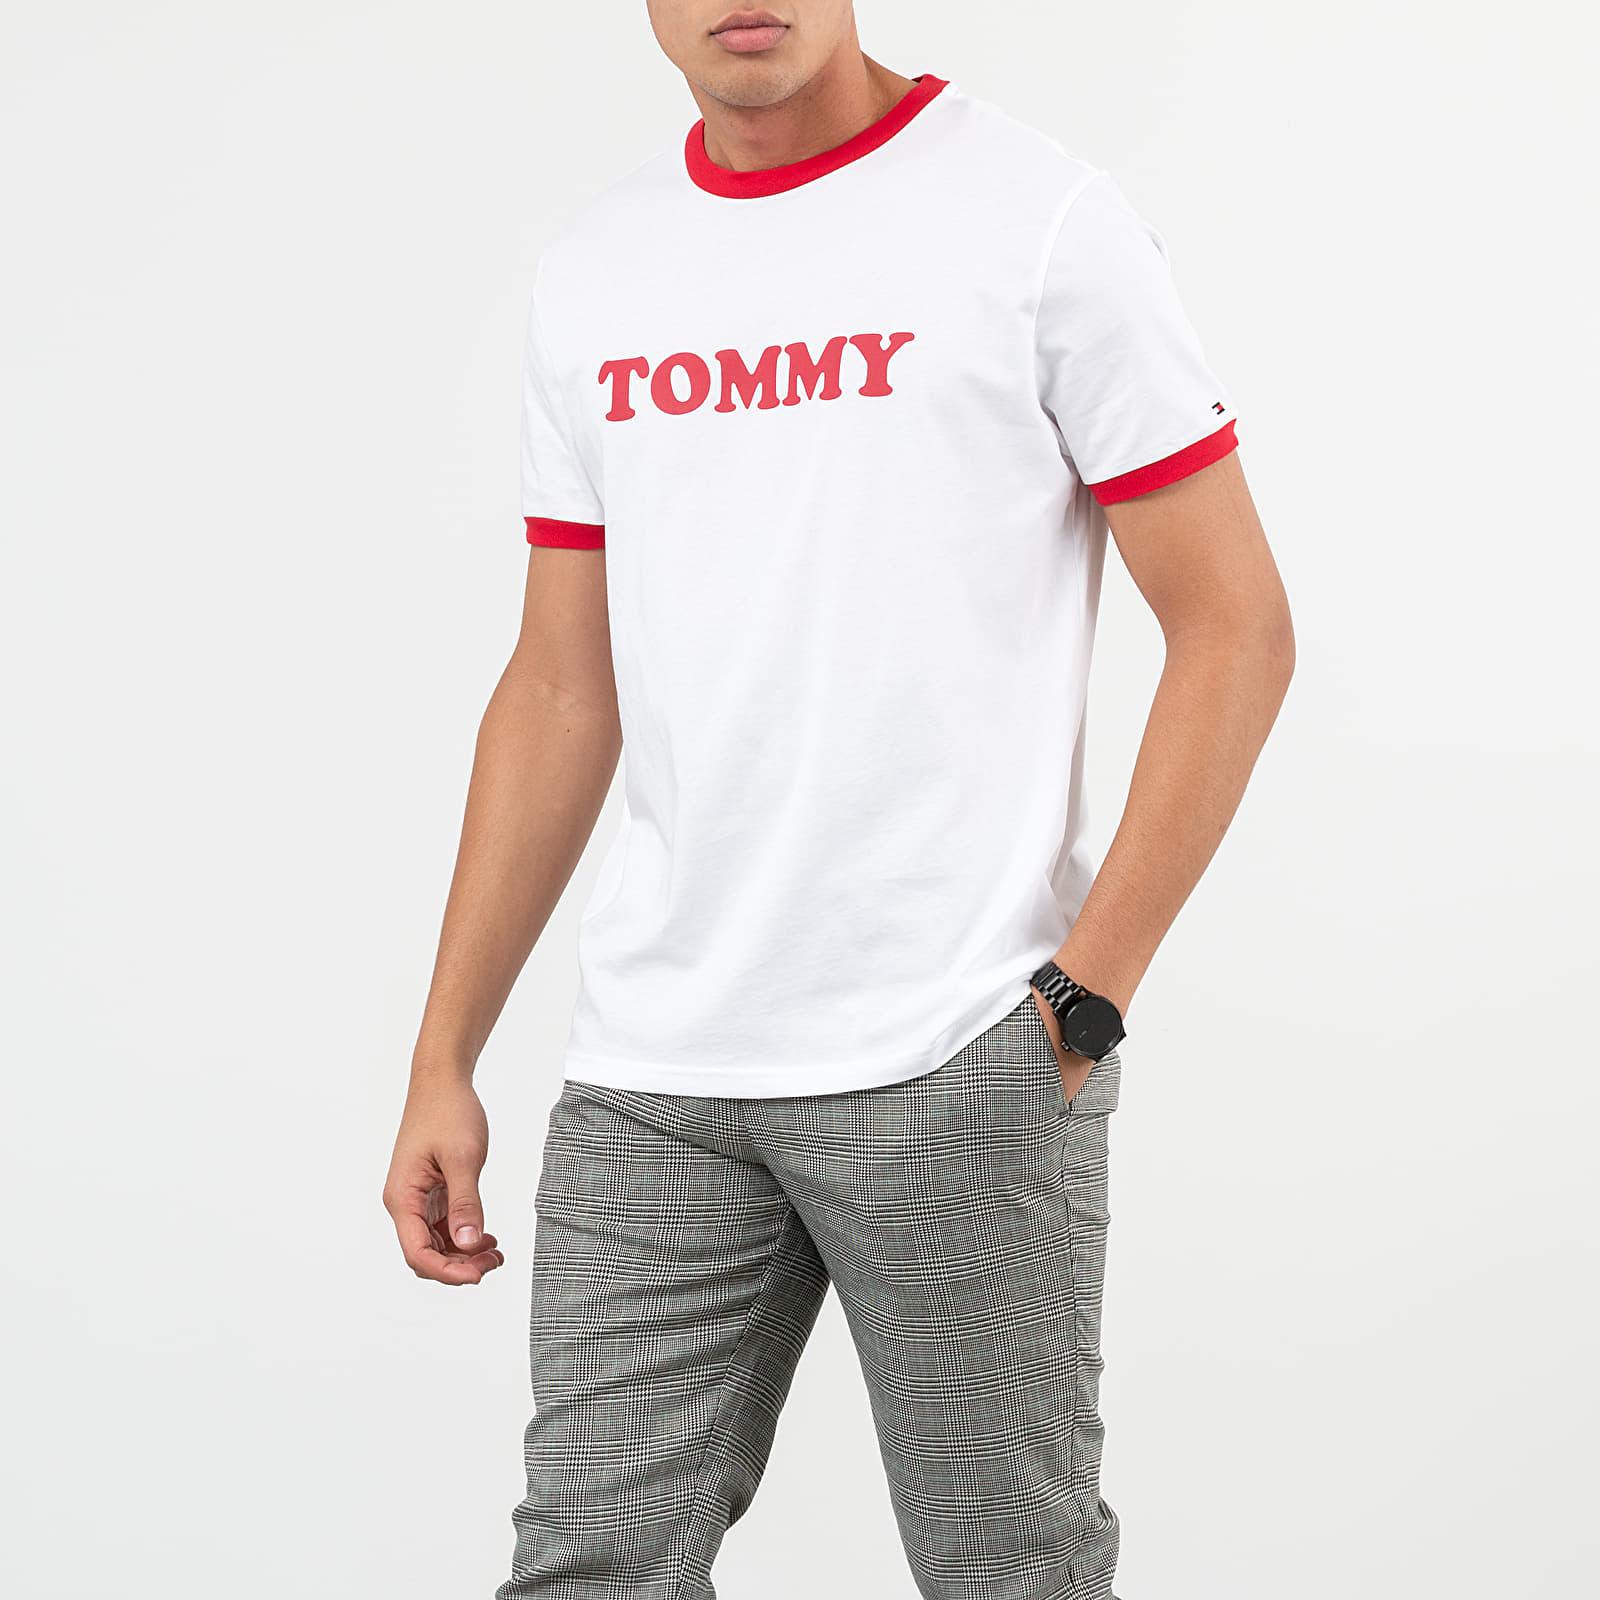 Tommy Hilfiger Tee Logo